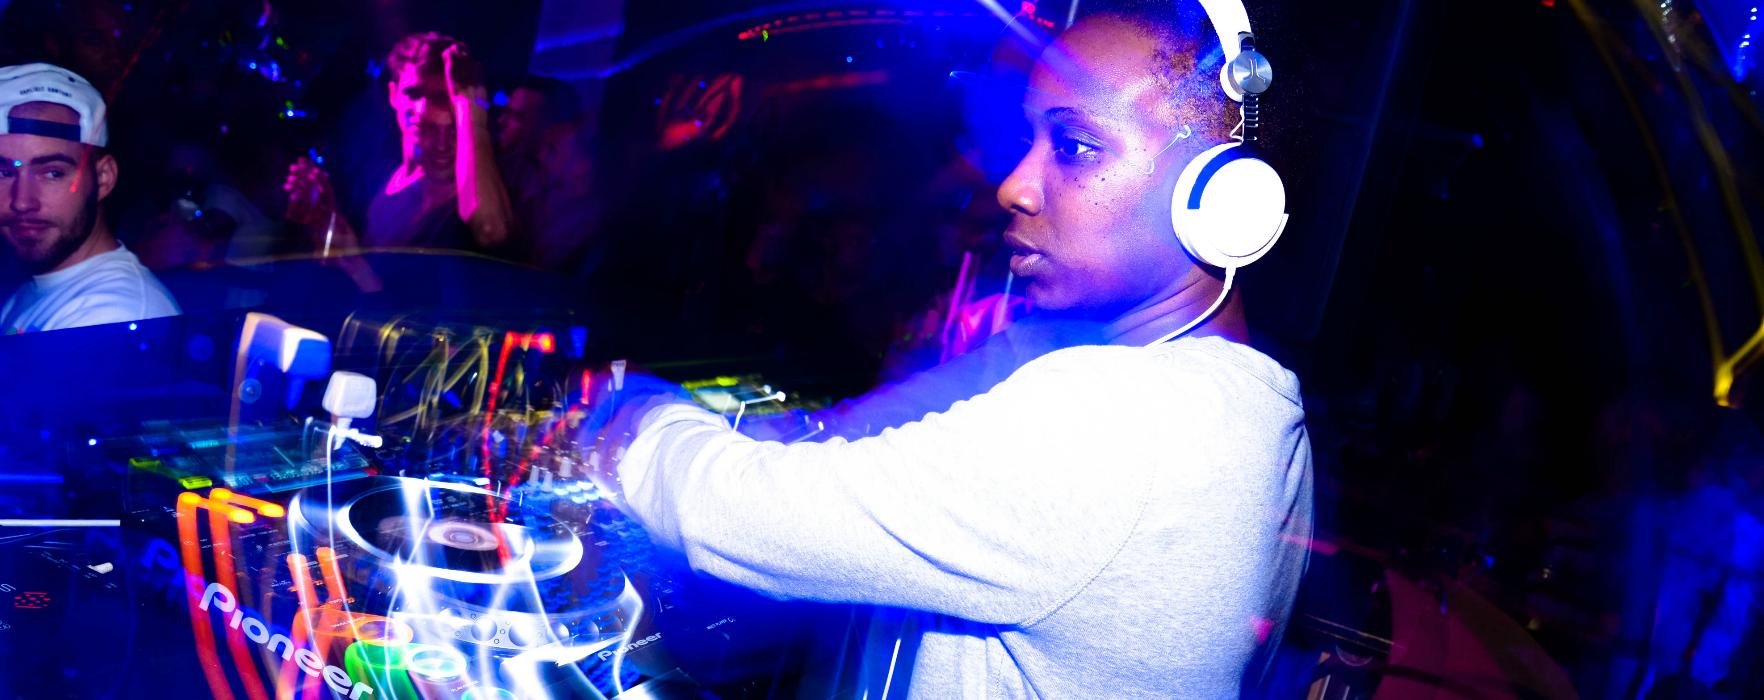 Article image - DJ CHILLZ